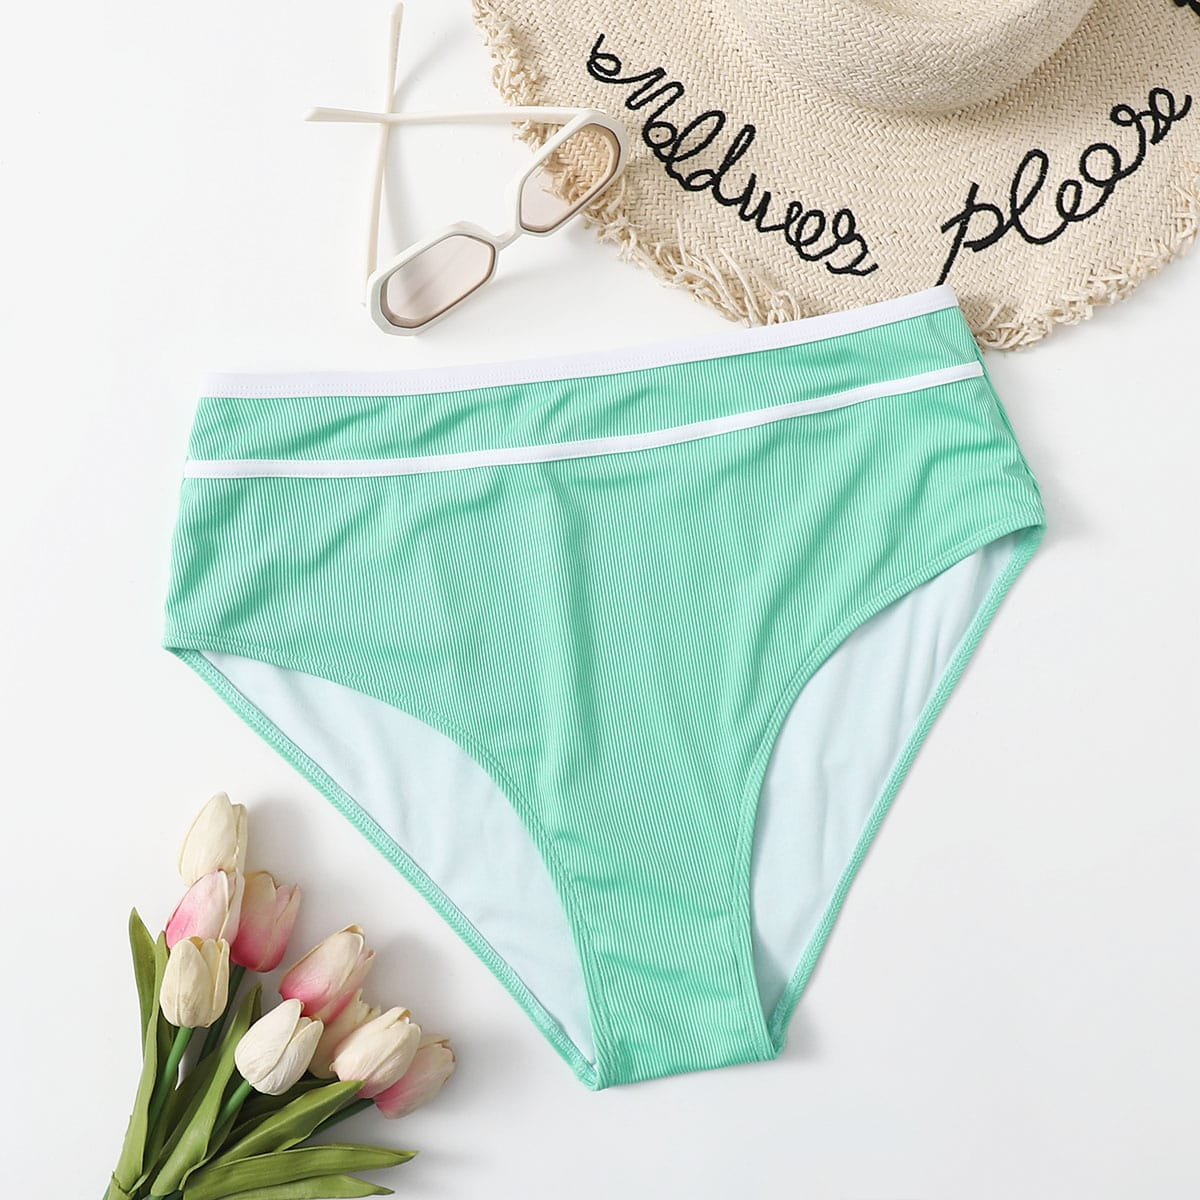 SHEIN Schattig Vlak Grote maat bikini bottom